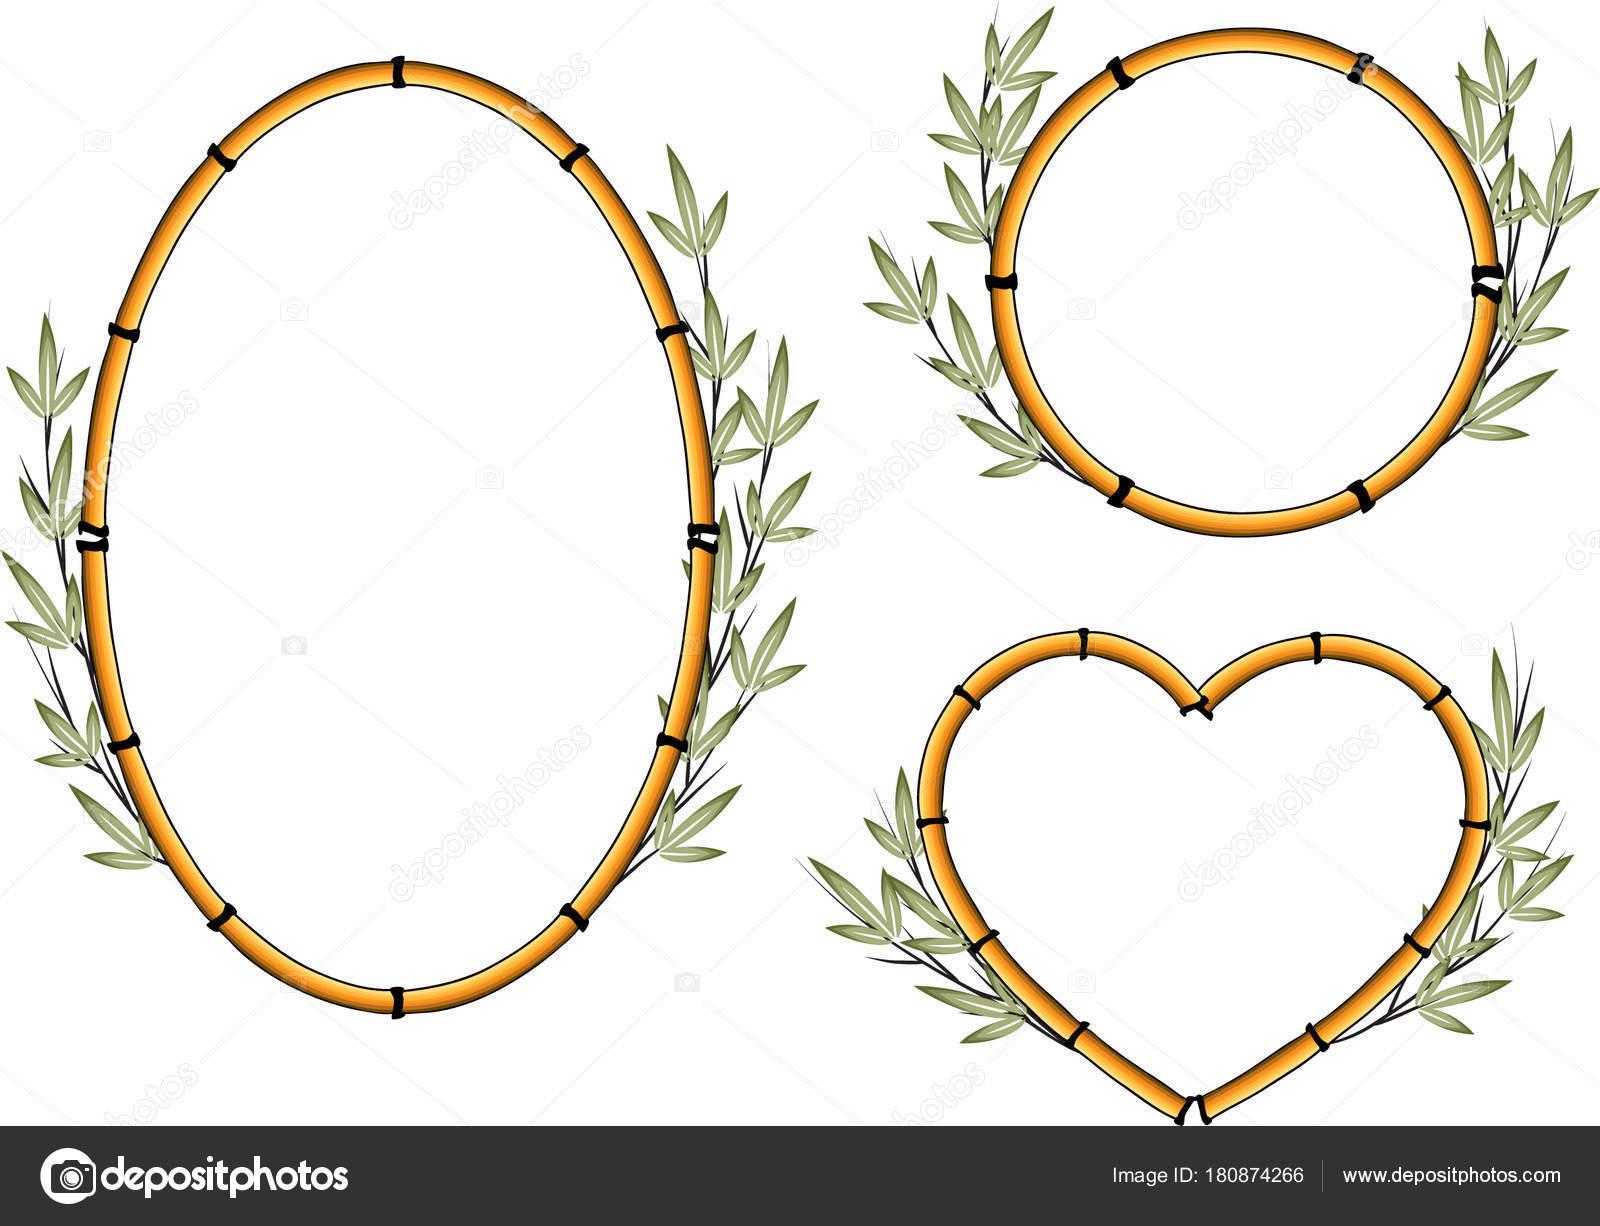 Bambus Vektor Zeichenprogramm Design — Stockvektor © wenpei #180874266